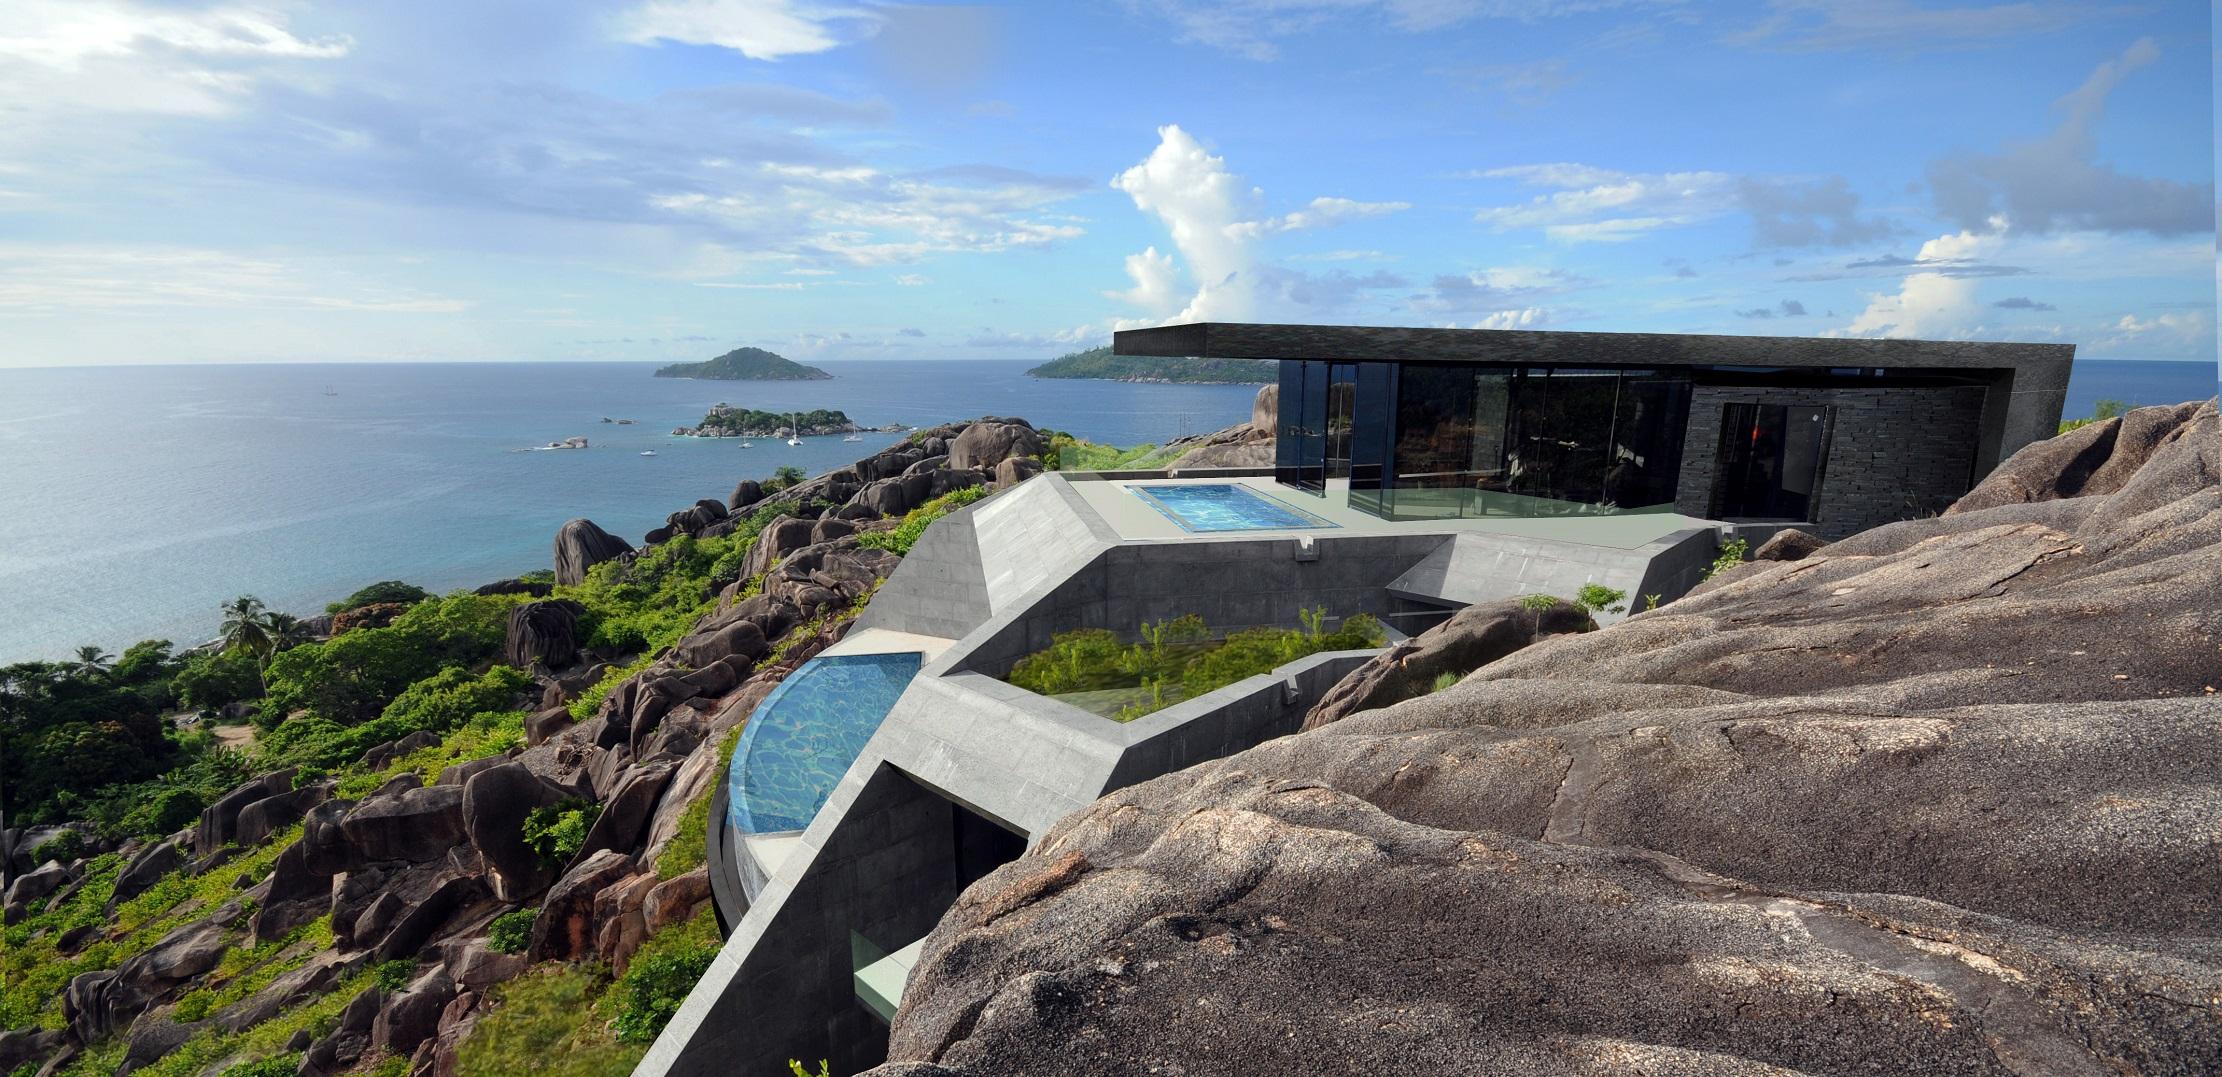 Bali Green Swimming Pool at Six Senses Resort Felicite Island Sexcelles2